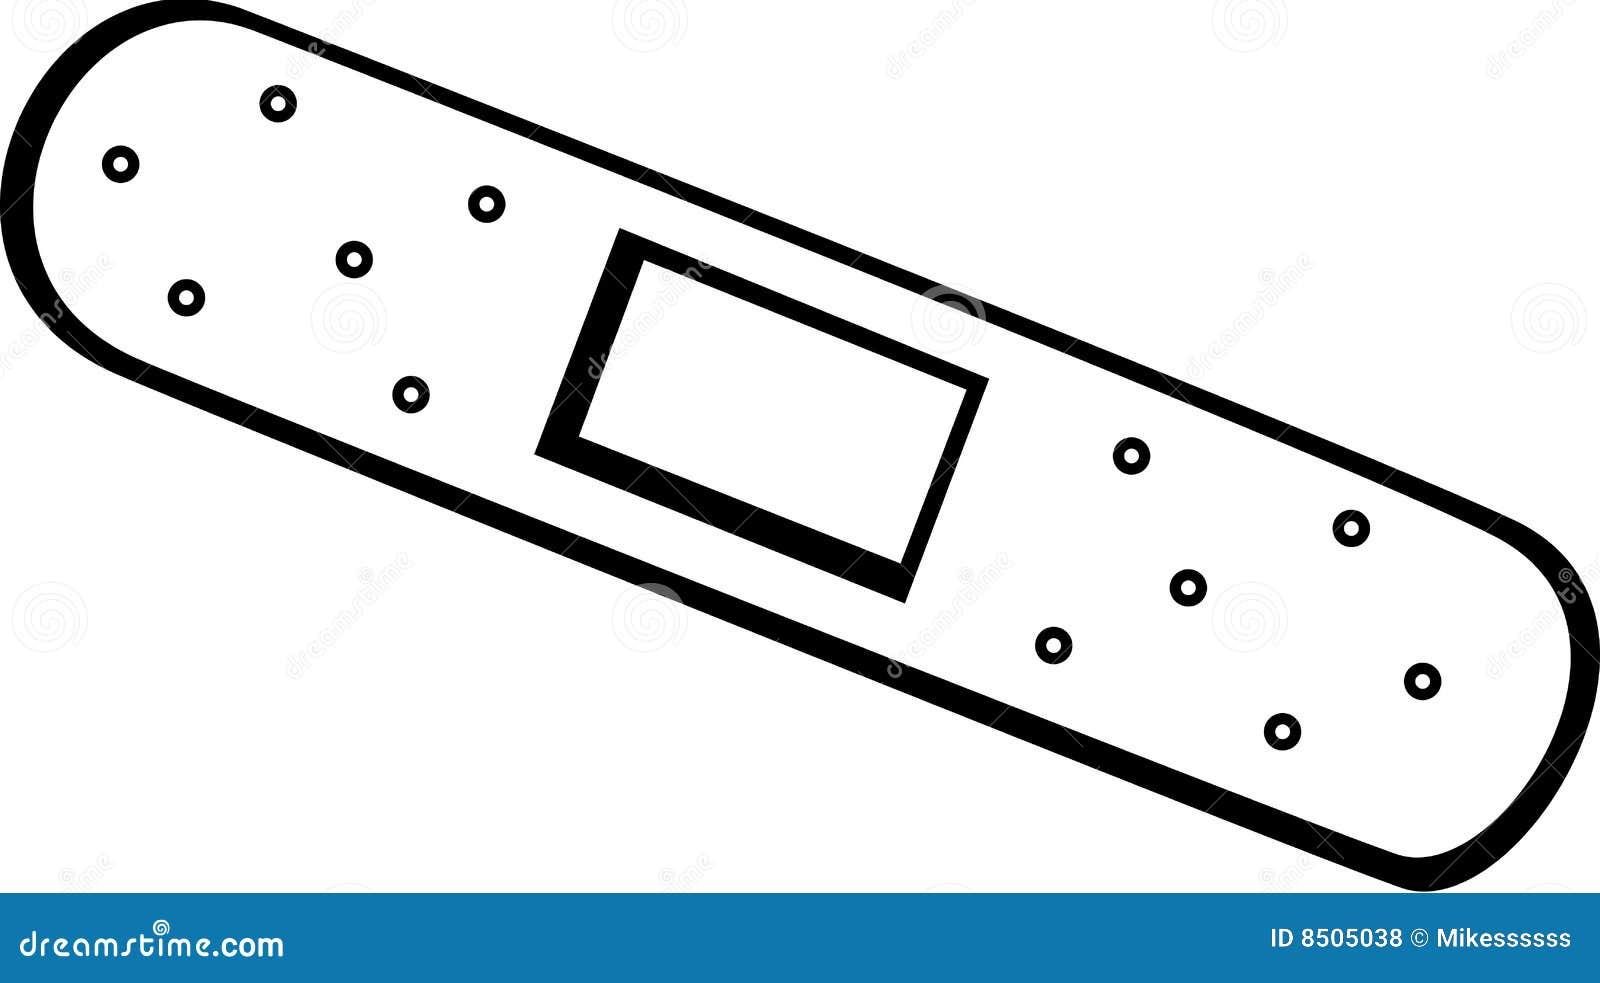 Adhesive Bandage Vector Illustration Royalty Free Stock Photos - Image ...